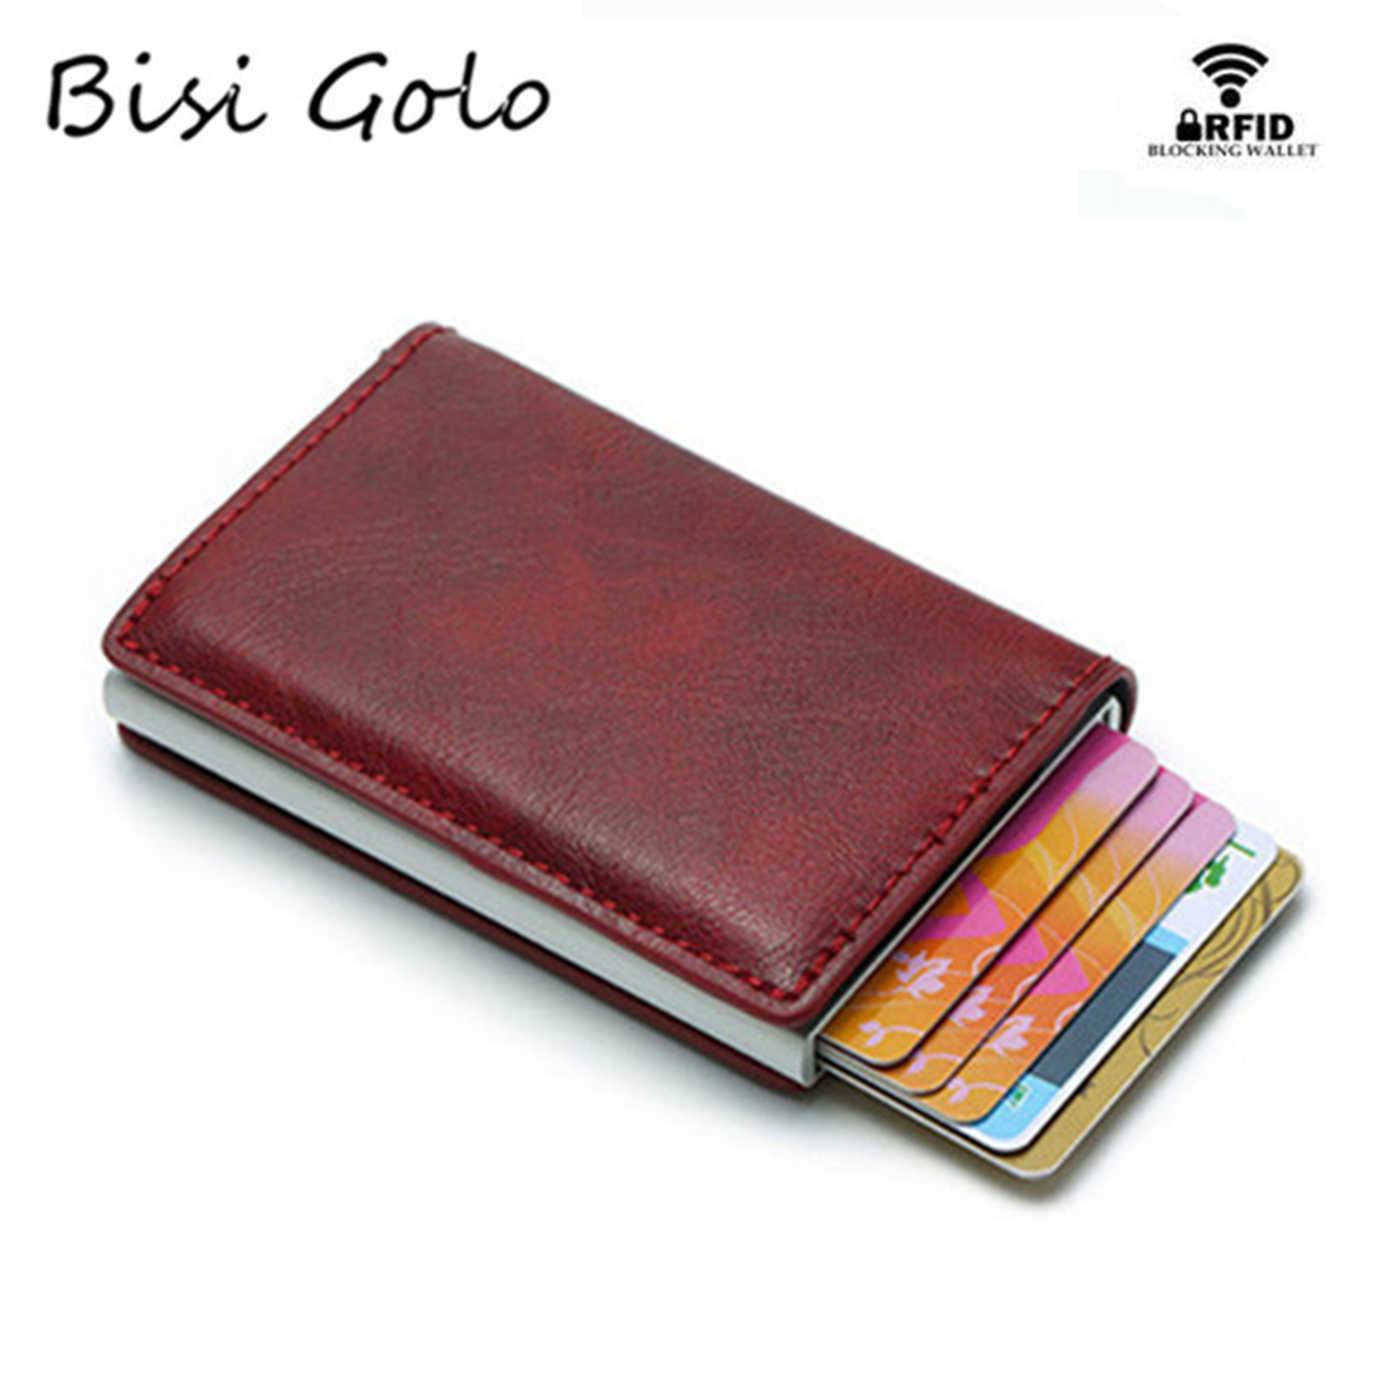 BISI GORO Antitheft Vintage Credit Card Holder Blocking Rfid Pop Up Wallet PU Leather Unisex Security Information Aluminum Purse